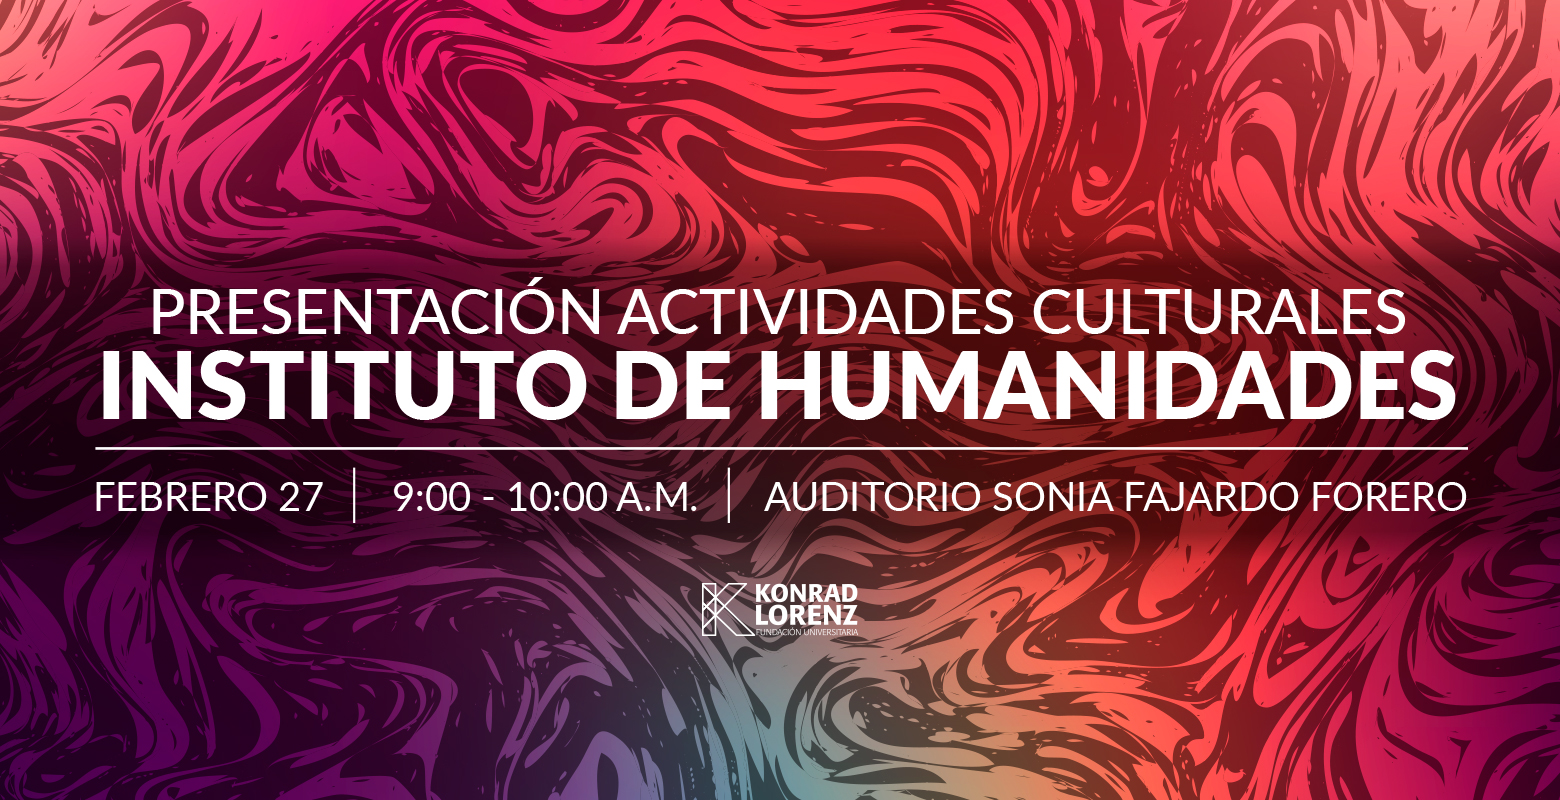 Actividades culturales del Instituto de Humanidades